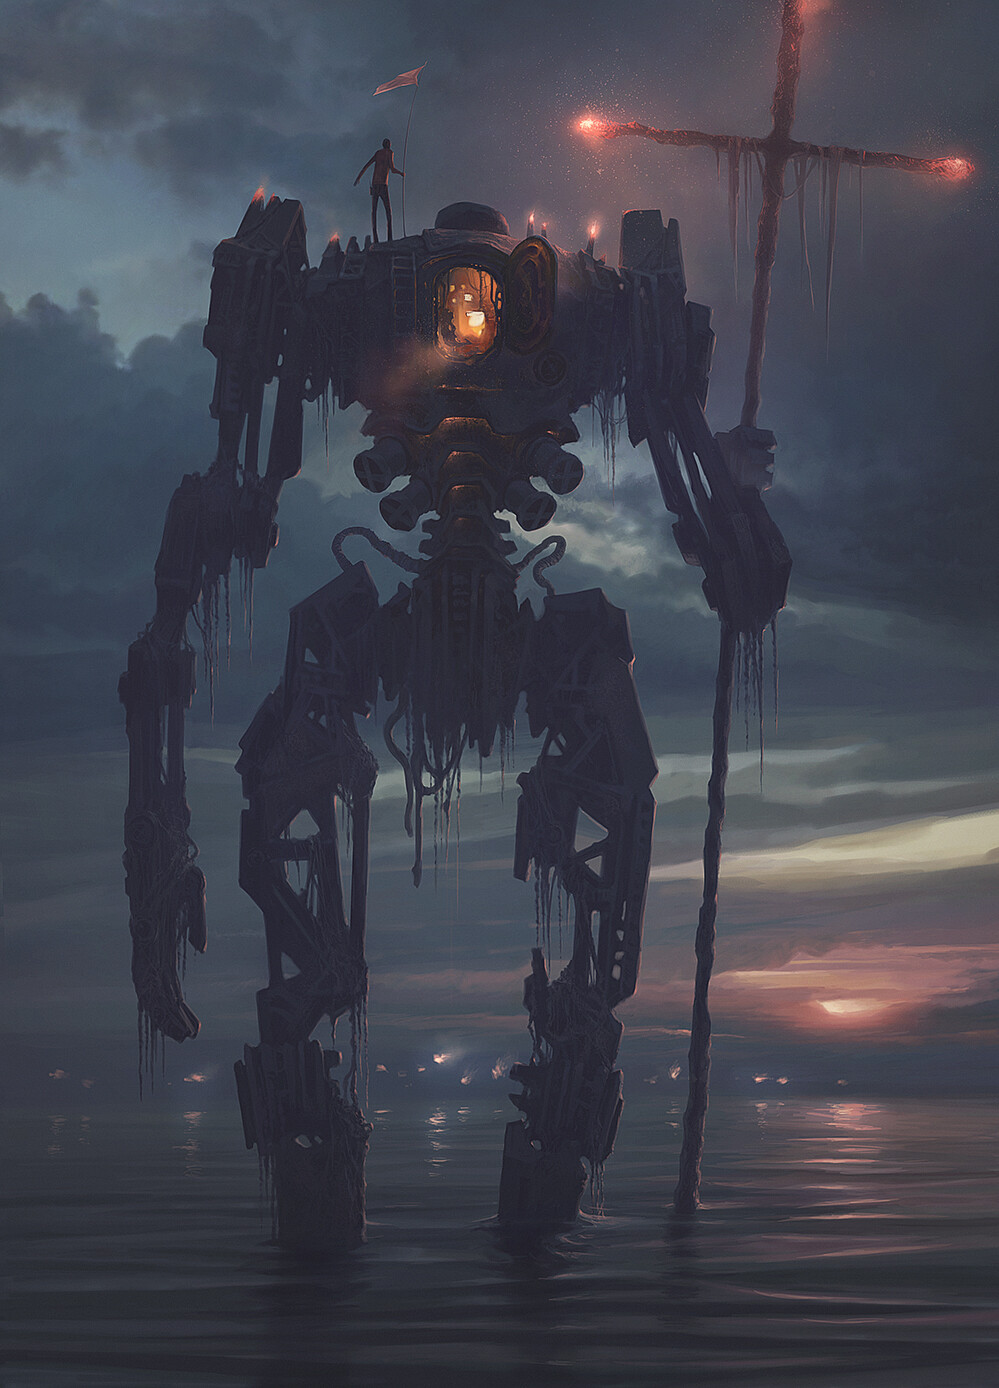 Alexey Egorov Digital Art Fantasy Art Robot Cross 999x1388